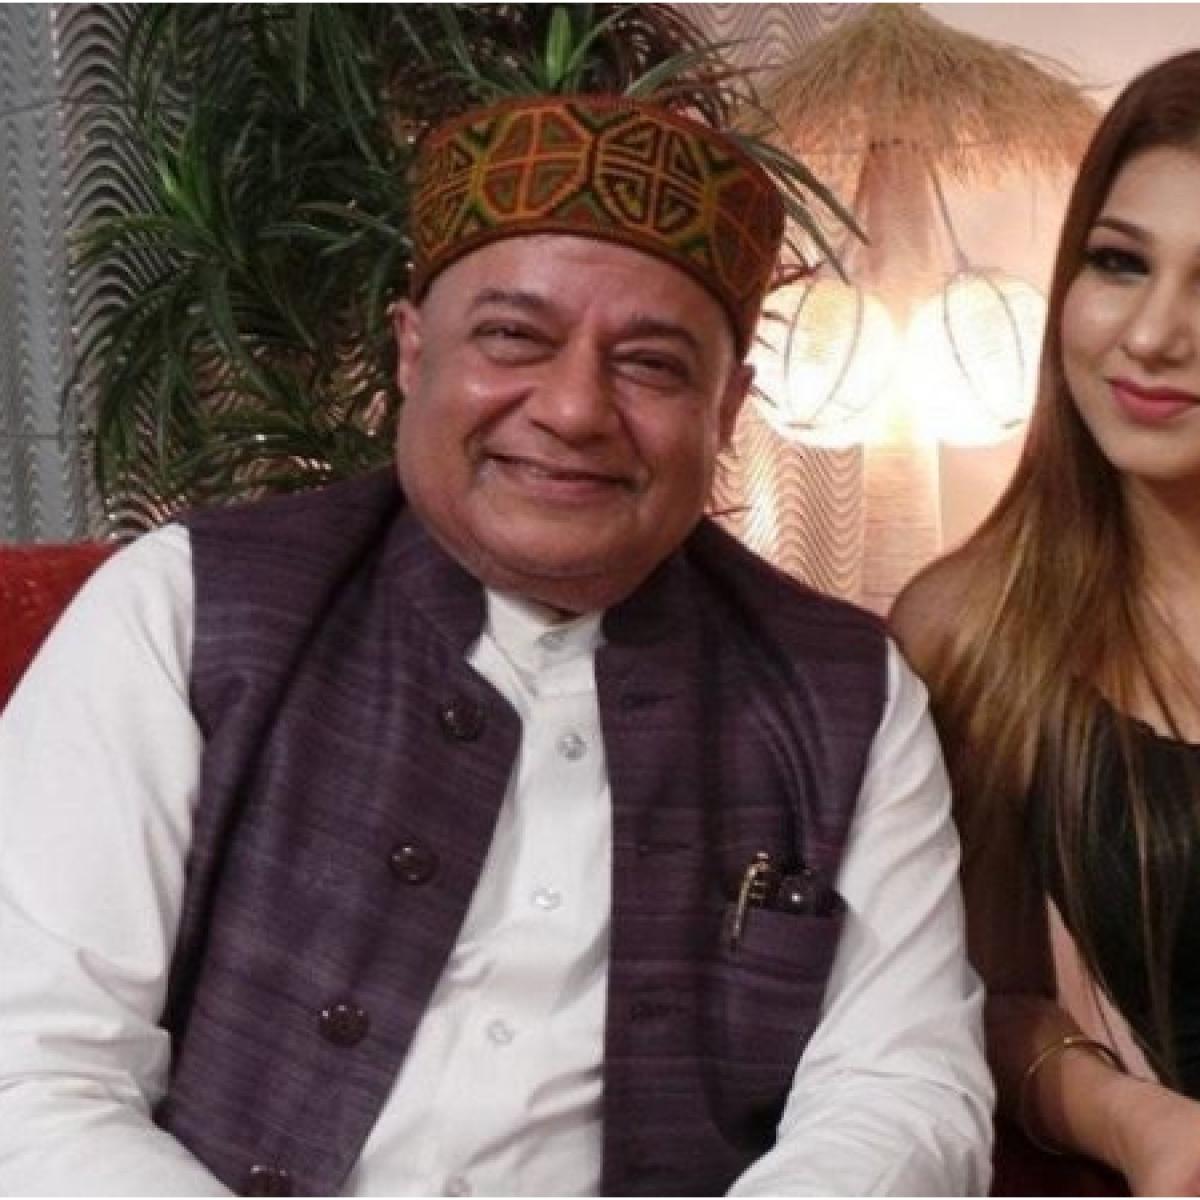 Former Bigg Boss contestants Anup Jalota, Jasleen Matharu to star in a film